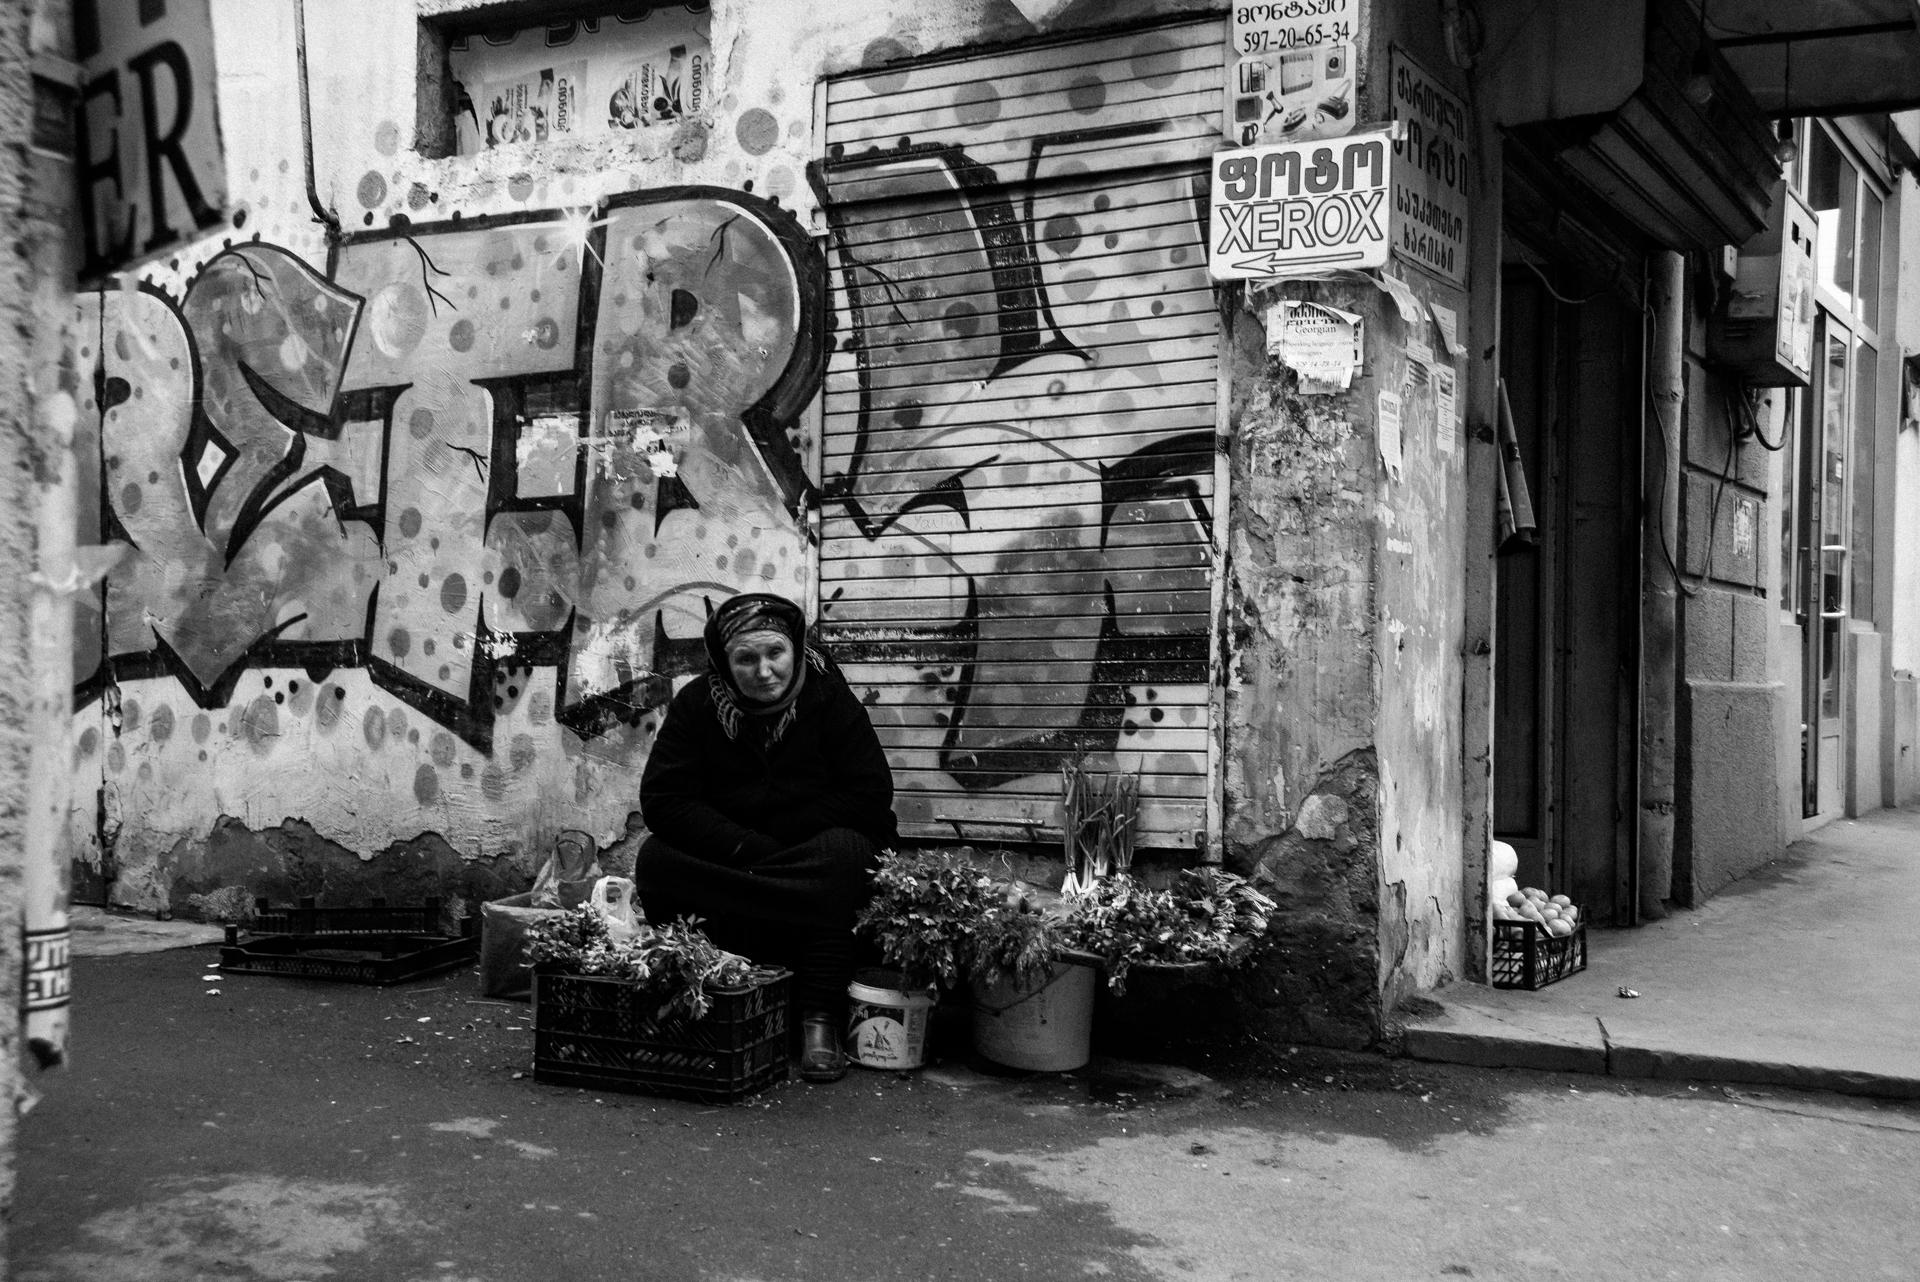 tbilisi-georgia-black-and-white-photography (12).jpg